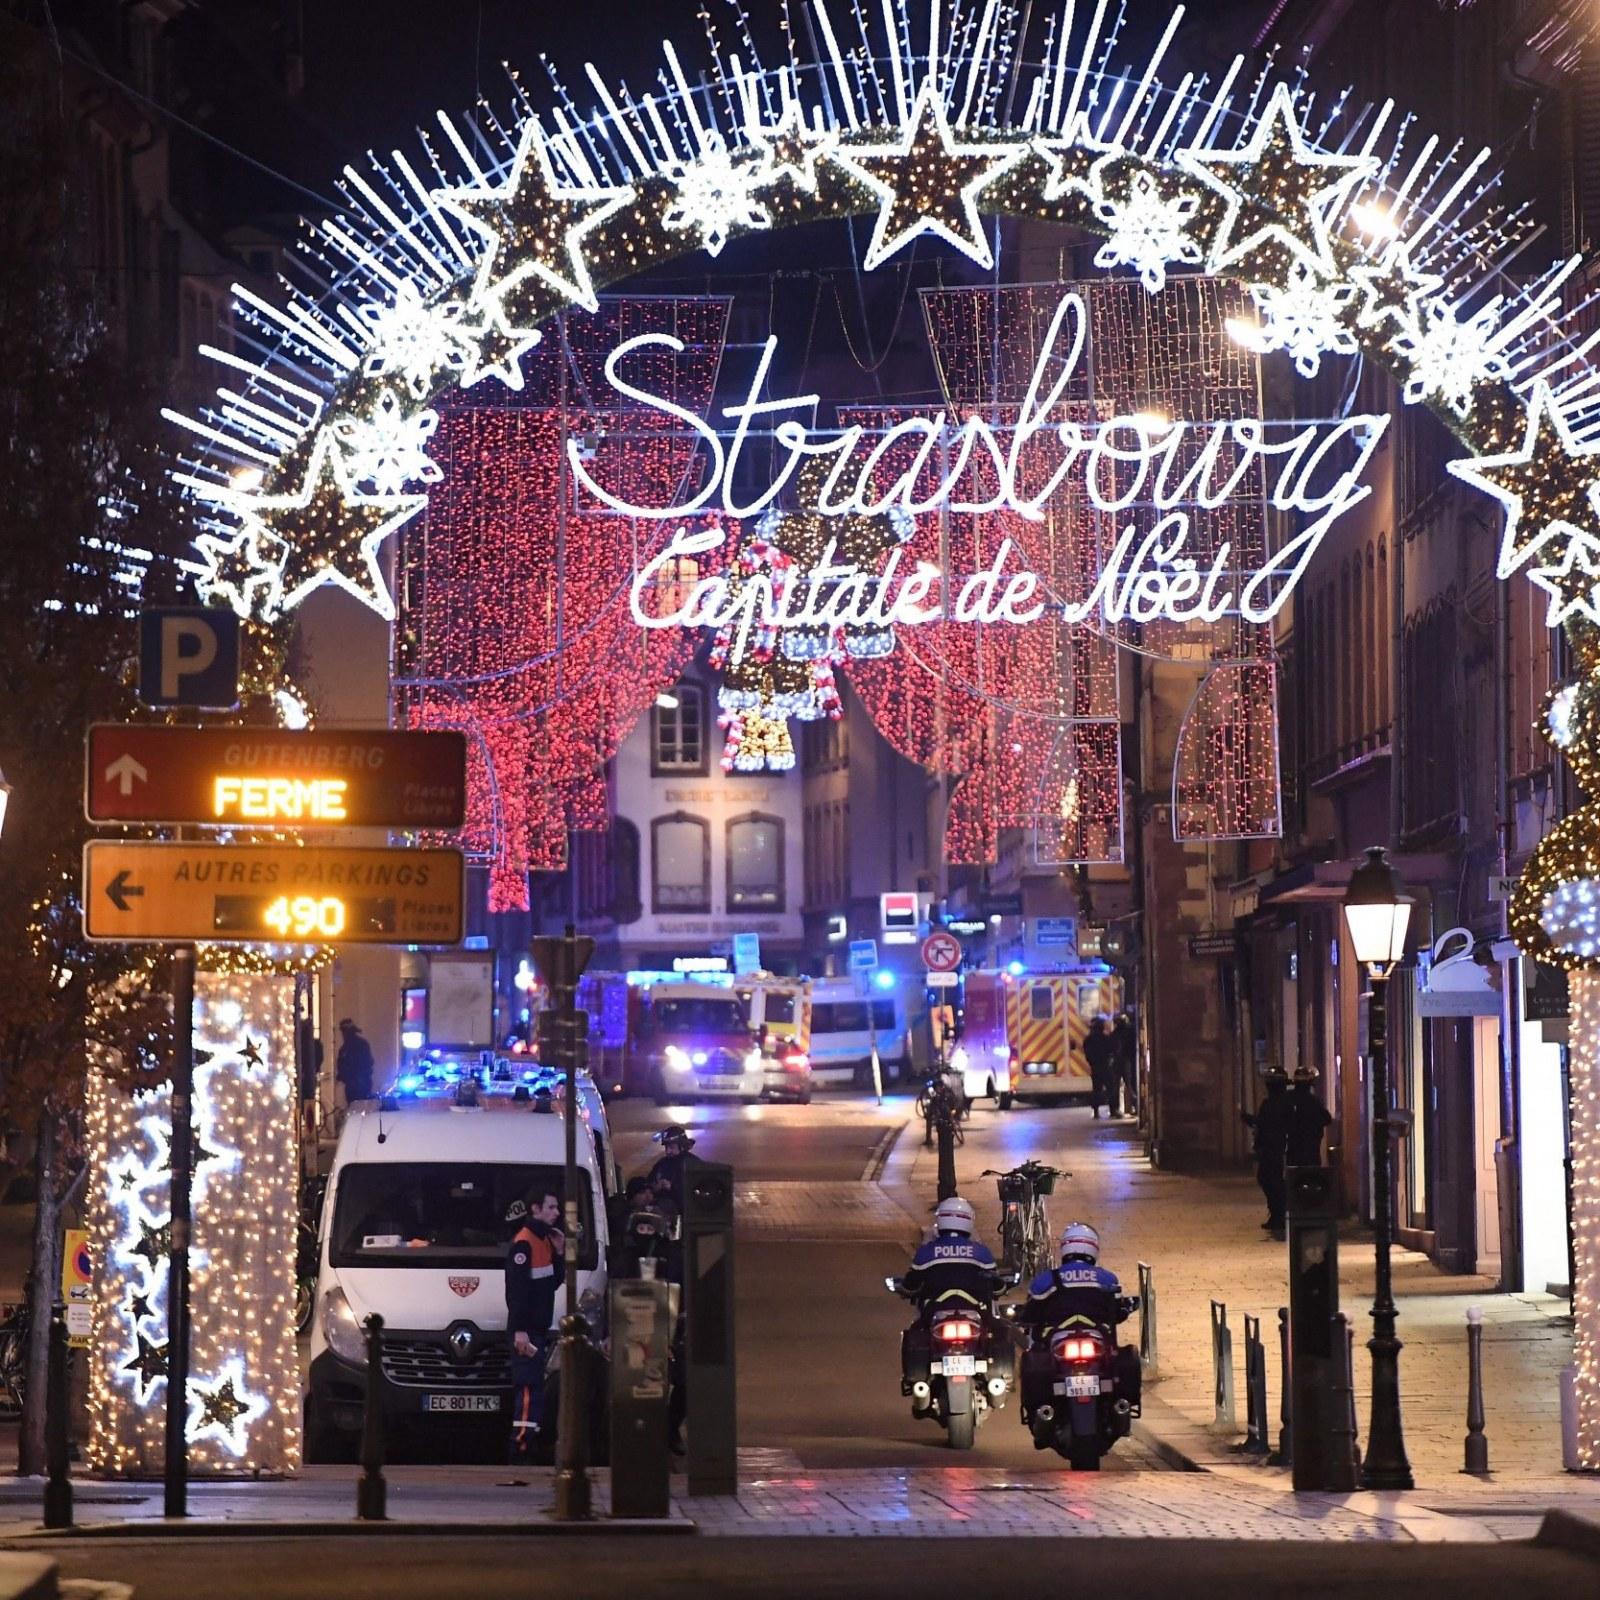 Strasbourg Christmas Market Shooting.Strasbourg Shooting Everything We Know After Gunman Opens